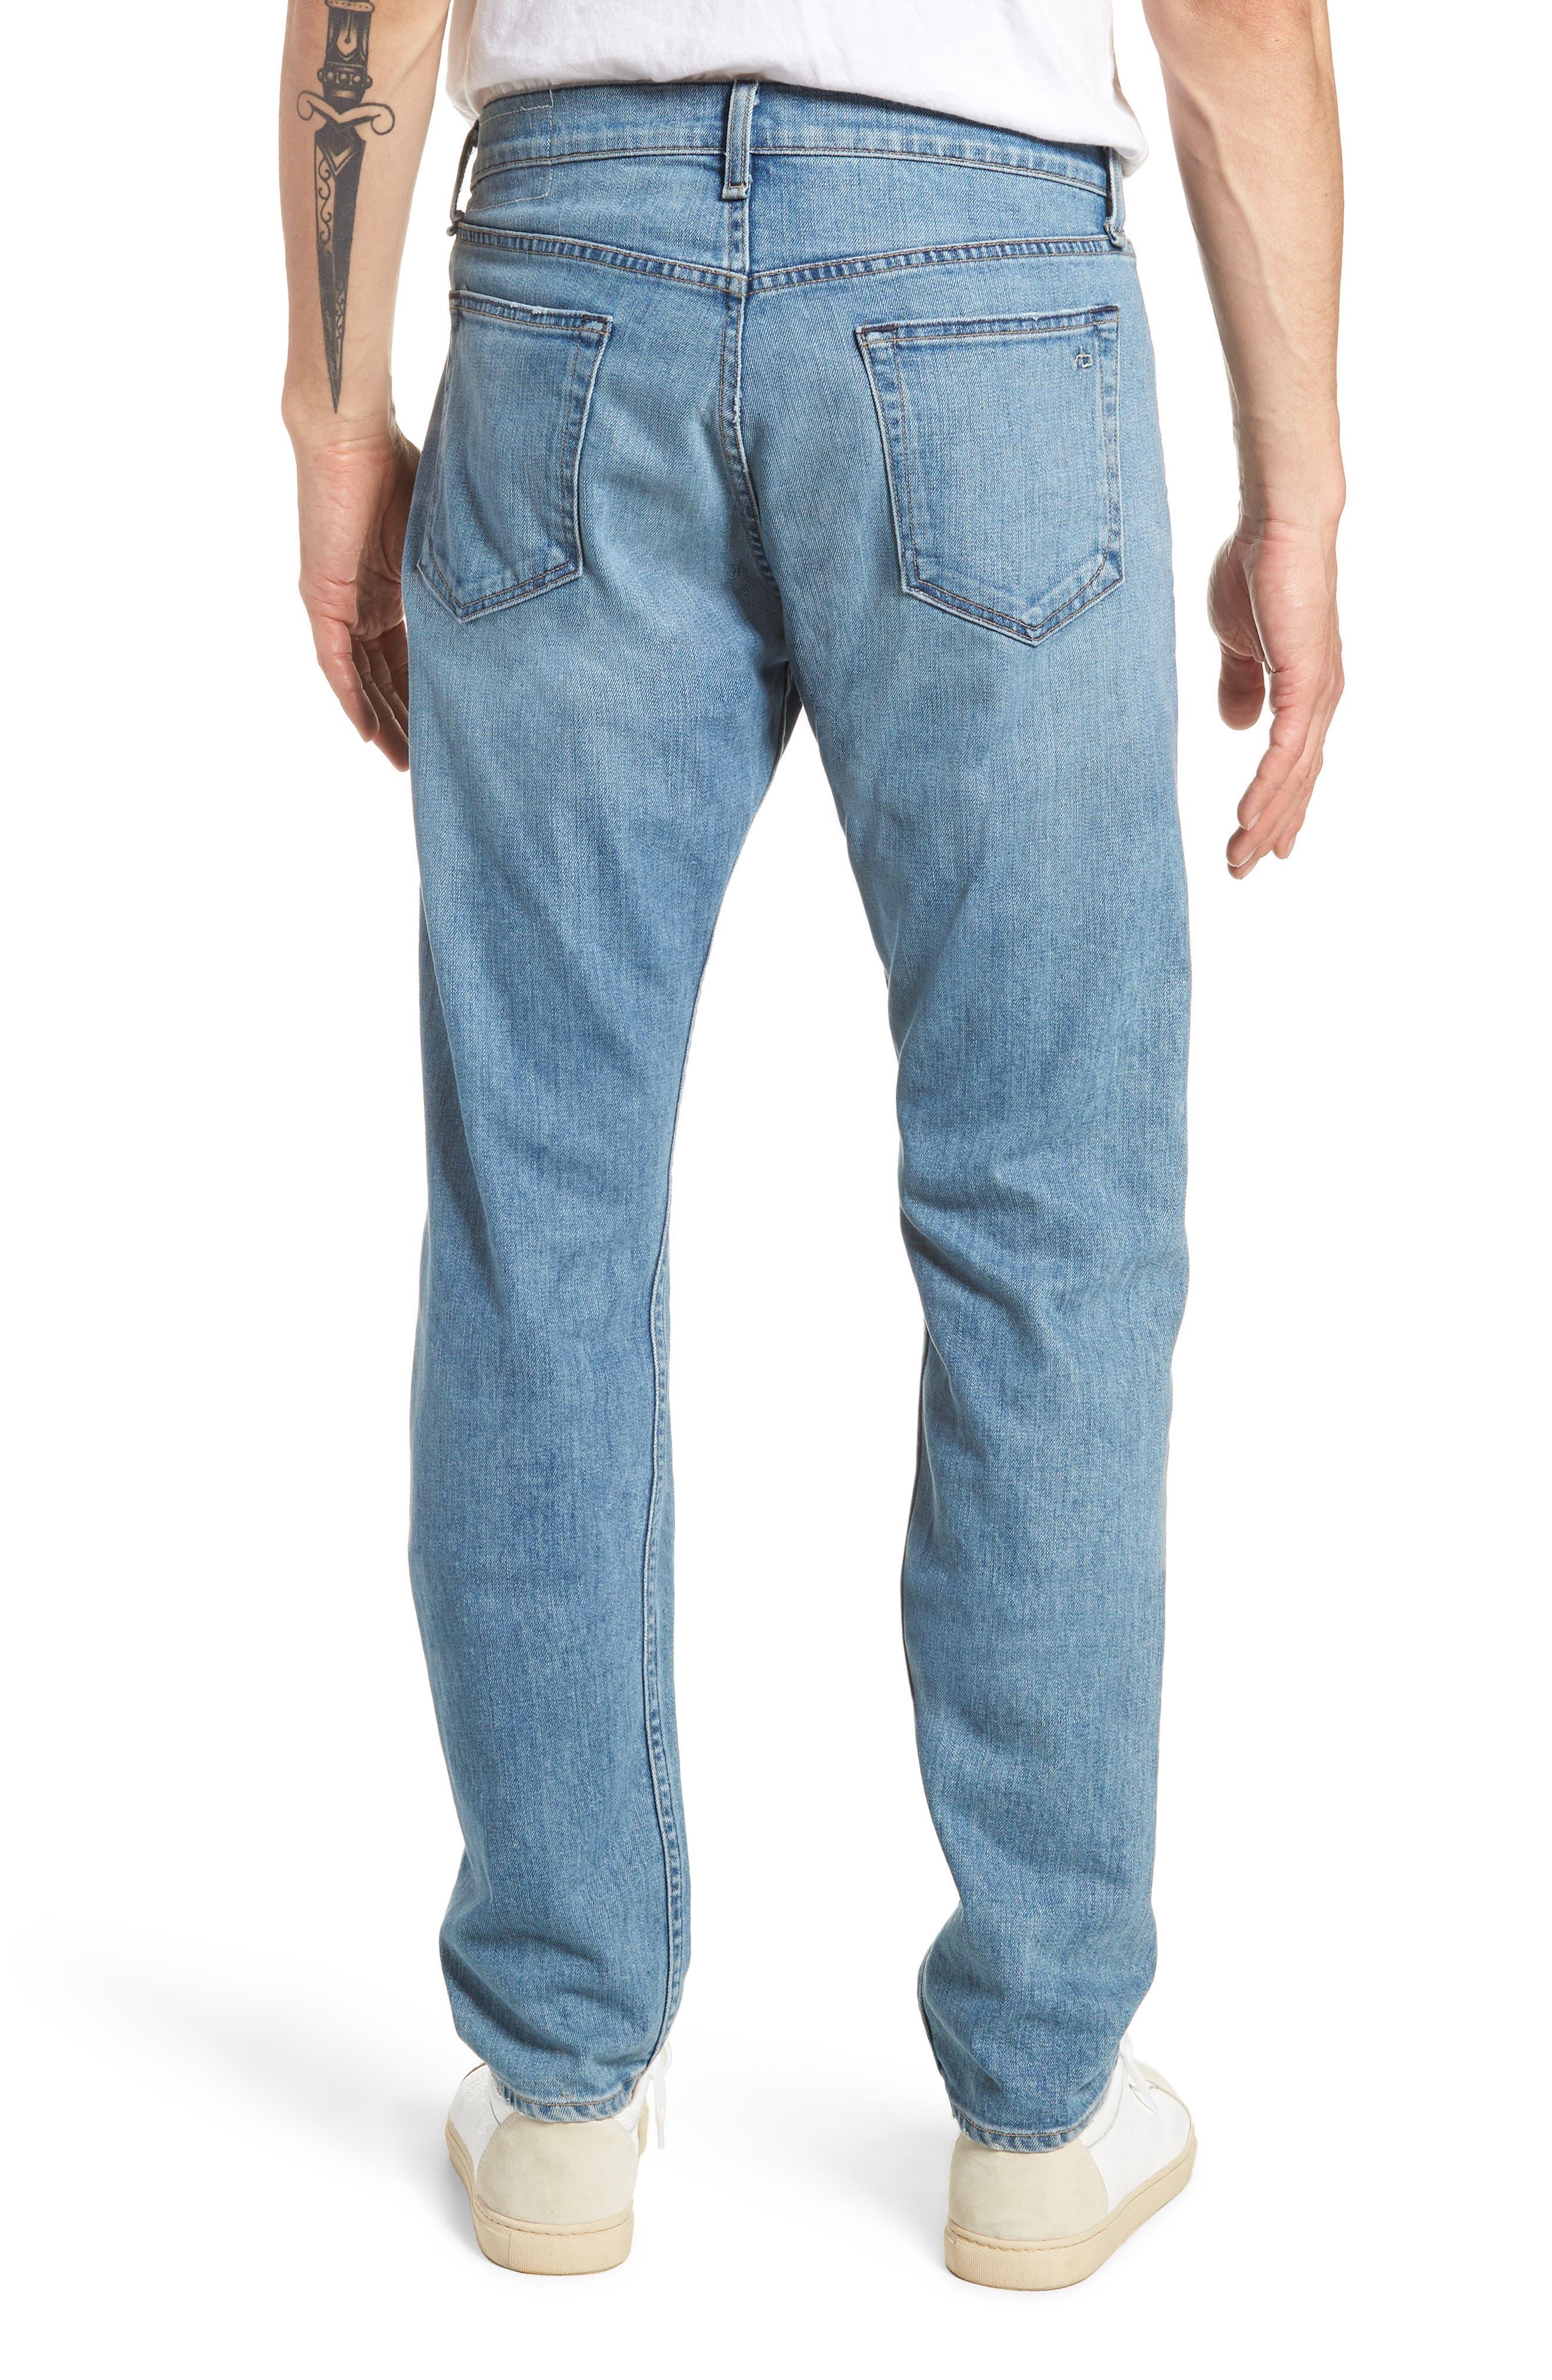 Fit 2 Slim Fit Jeans,                             Alternate thumbnail 2, color,                             PYLLE